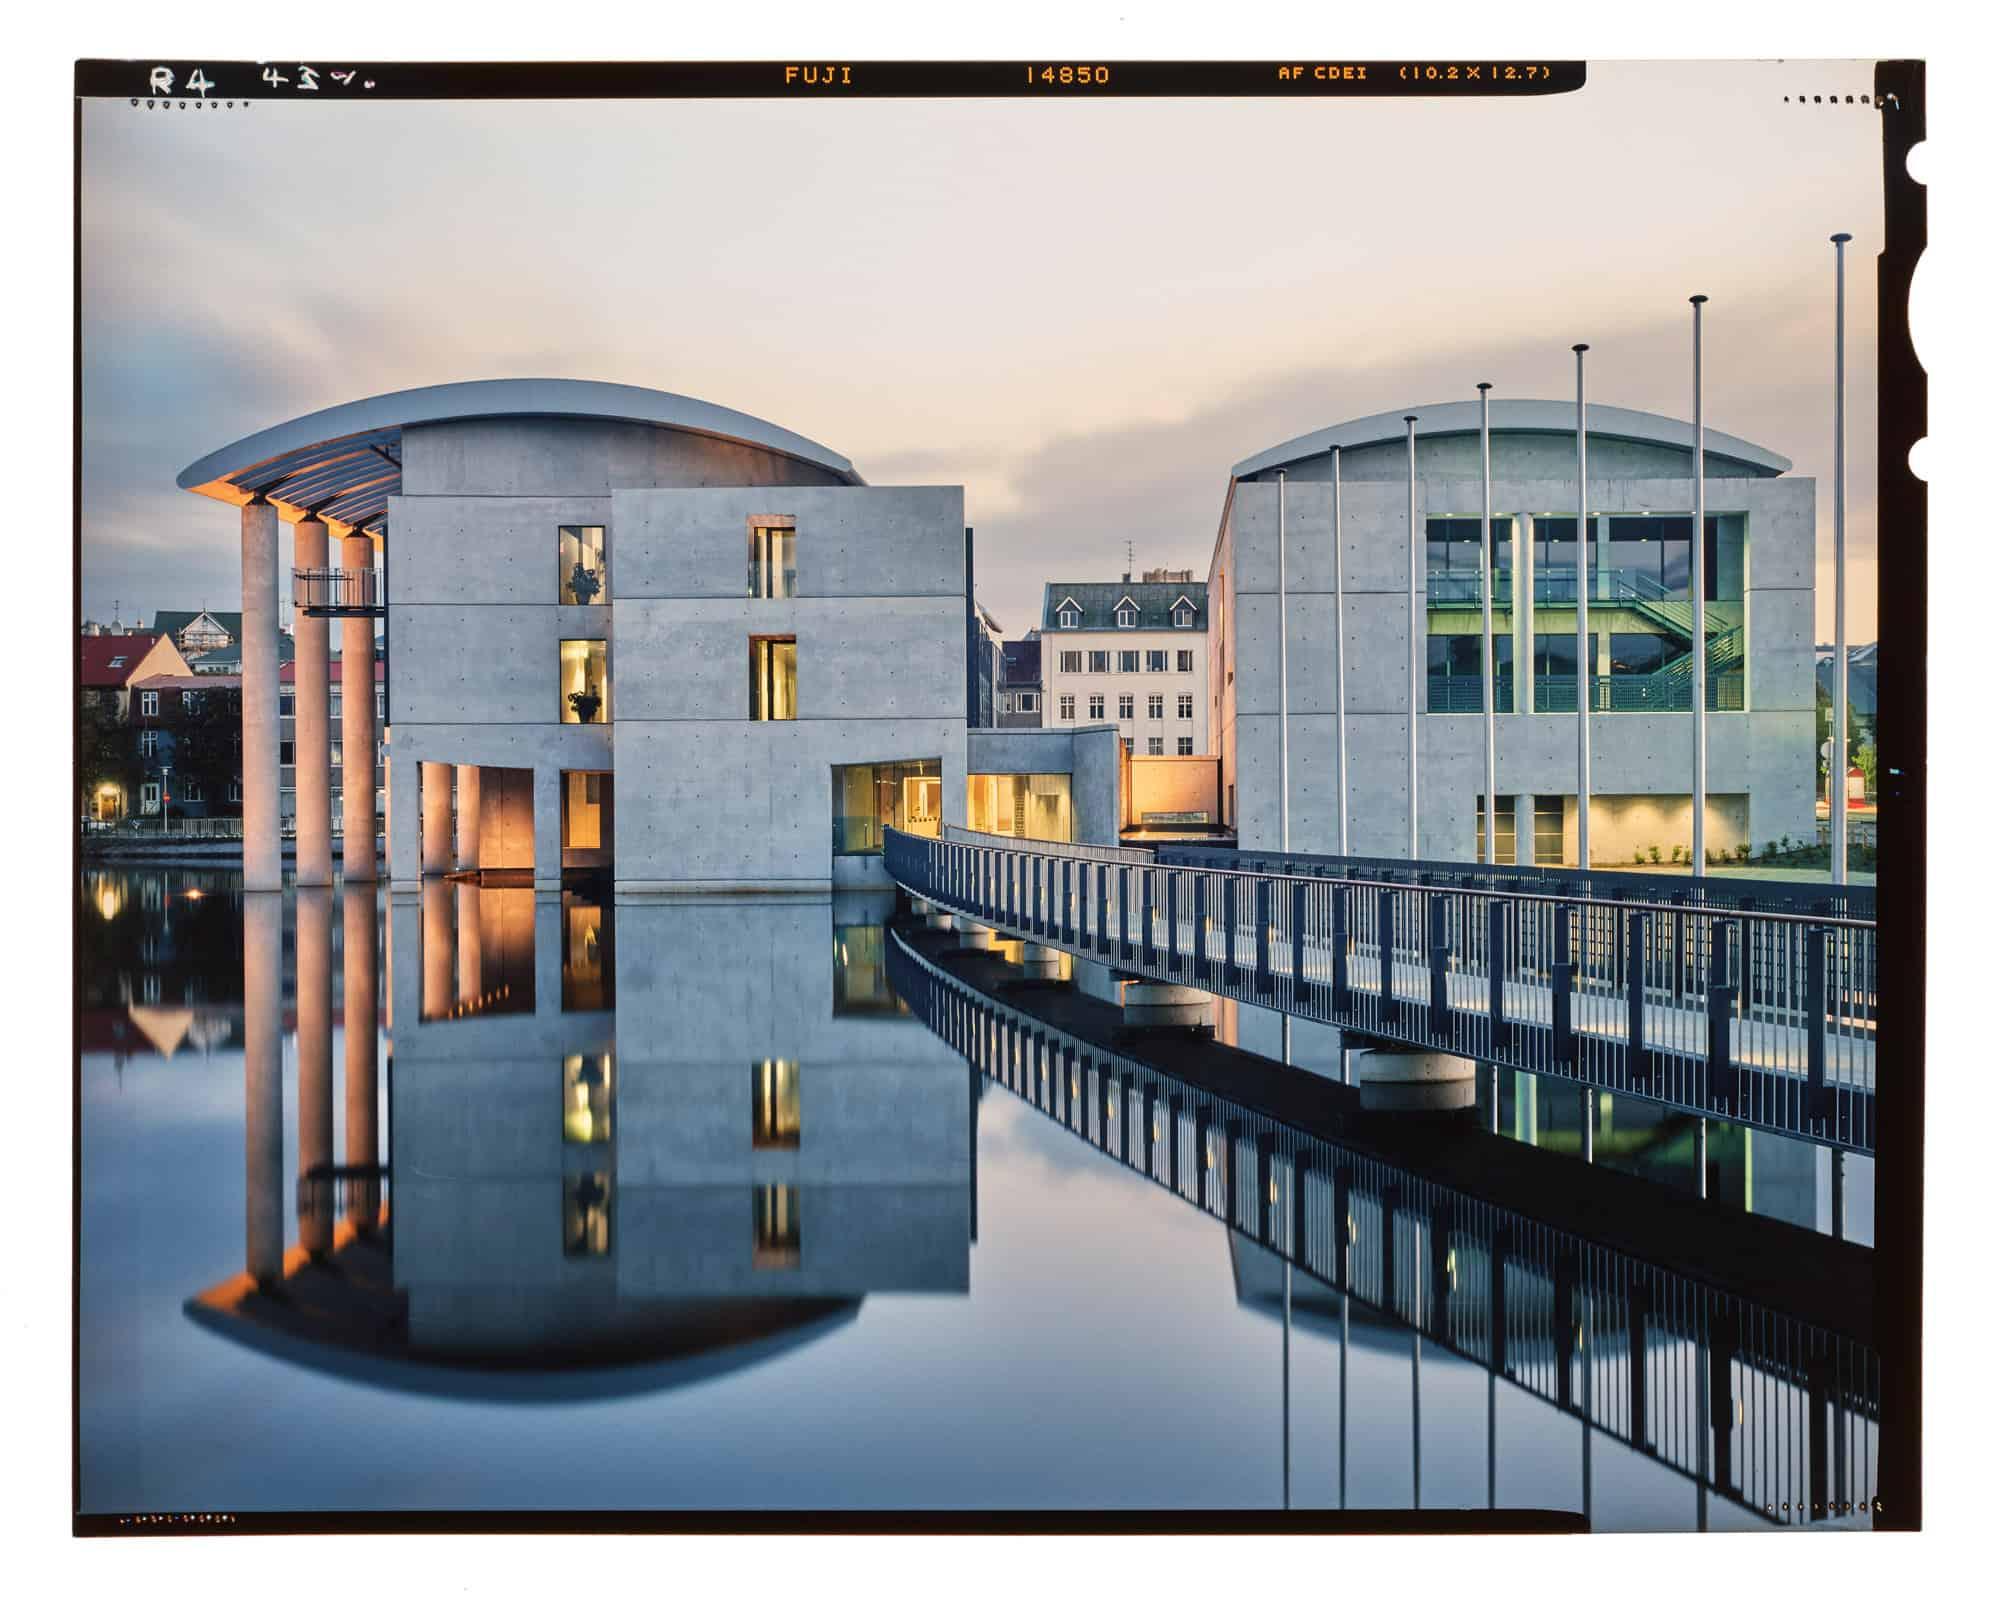 City Hall Reykjavik at dusk in the lake